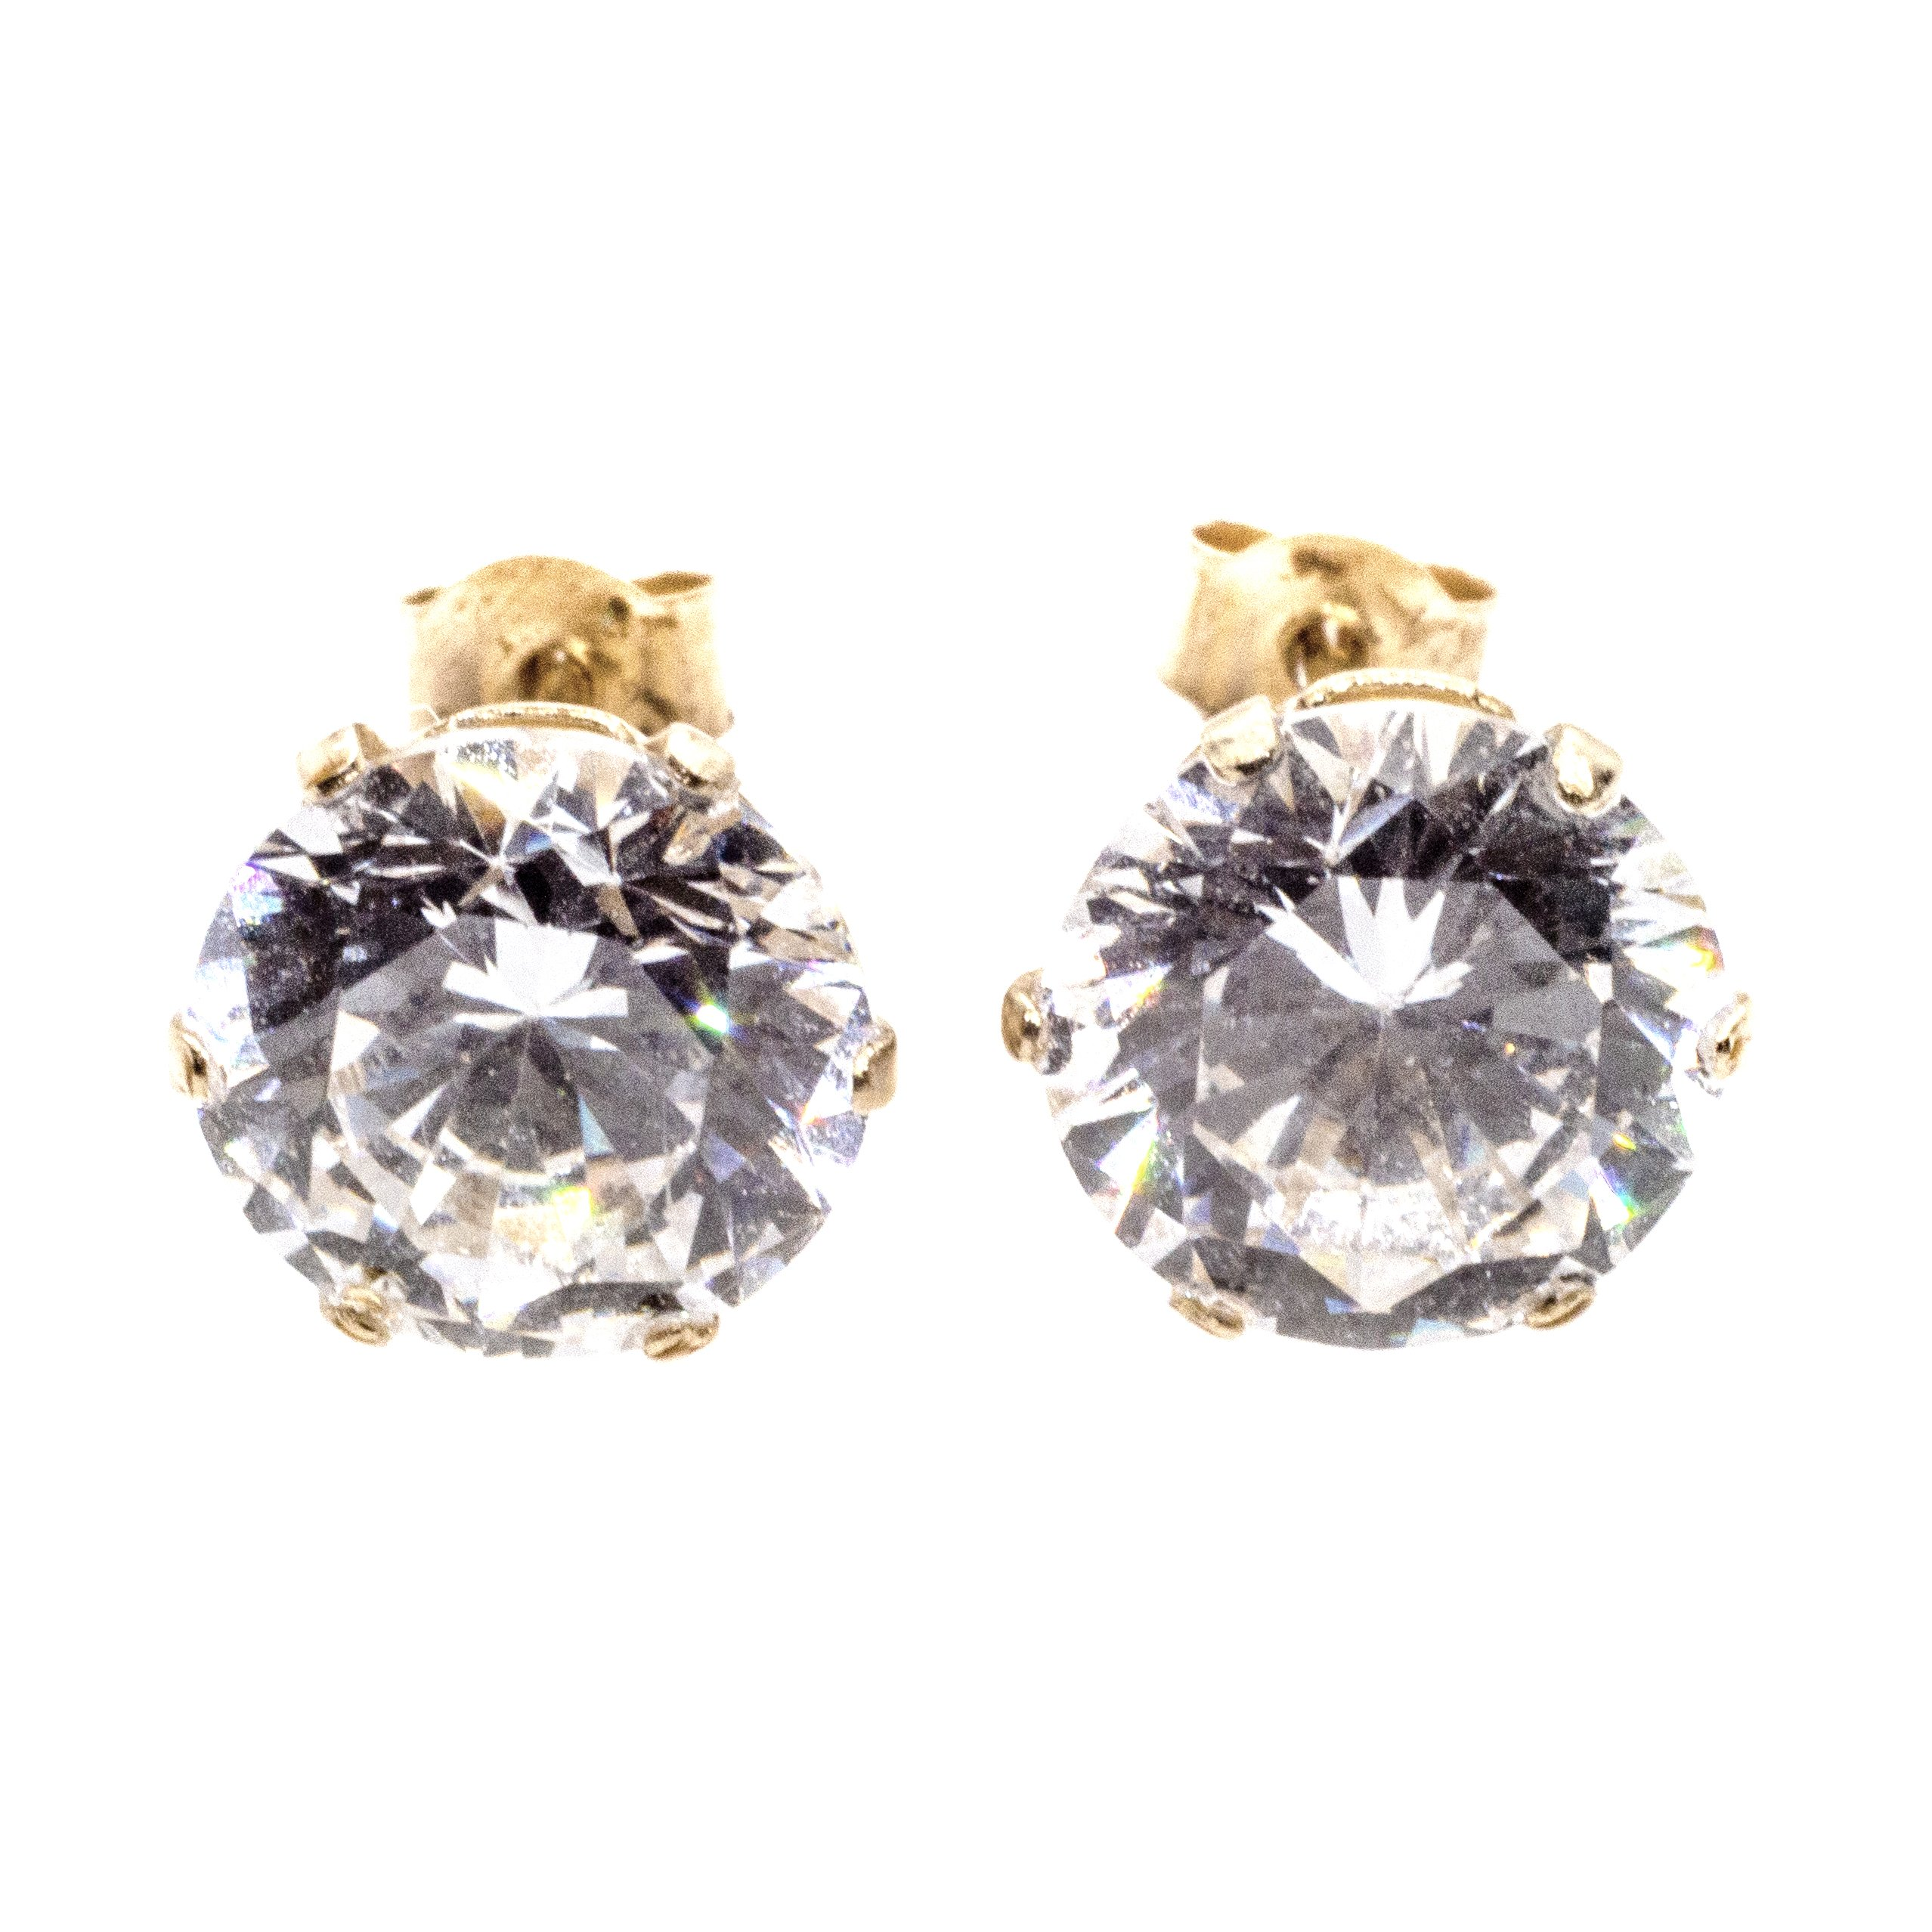 7mm CZ stud earrings 9ct yellow gold alt 5